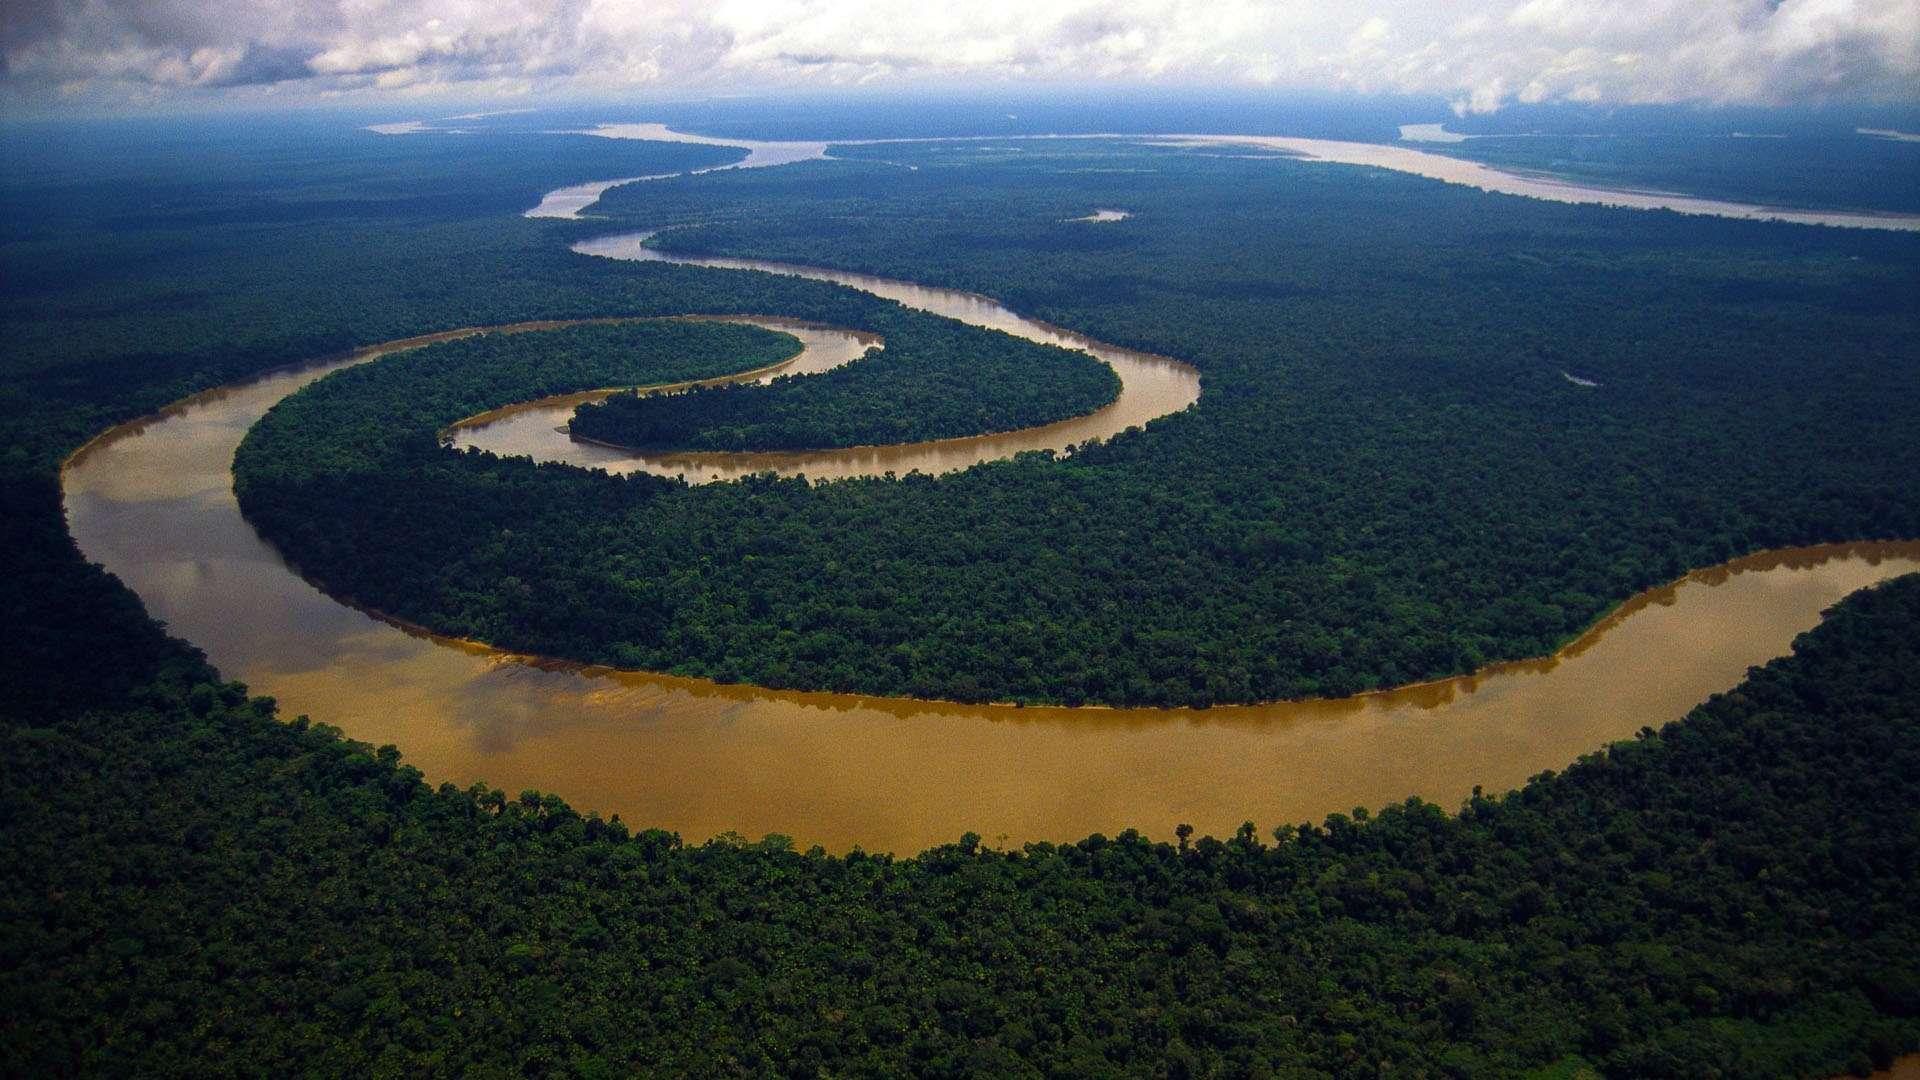 http://geographyofrussia.ru/wp-content/uploads/2009/04/Meandering-Tigre-river-Peruvian-Amazon_www.FullHDWpp.com_.jpg